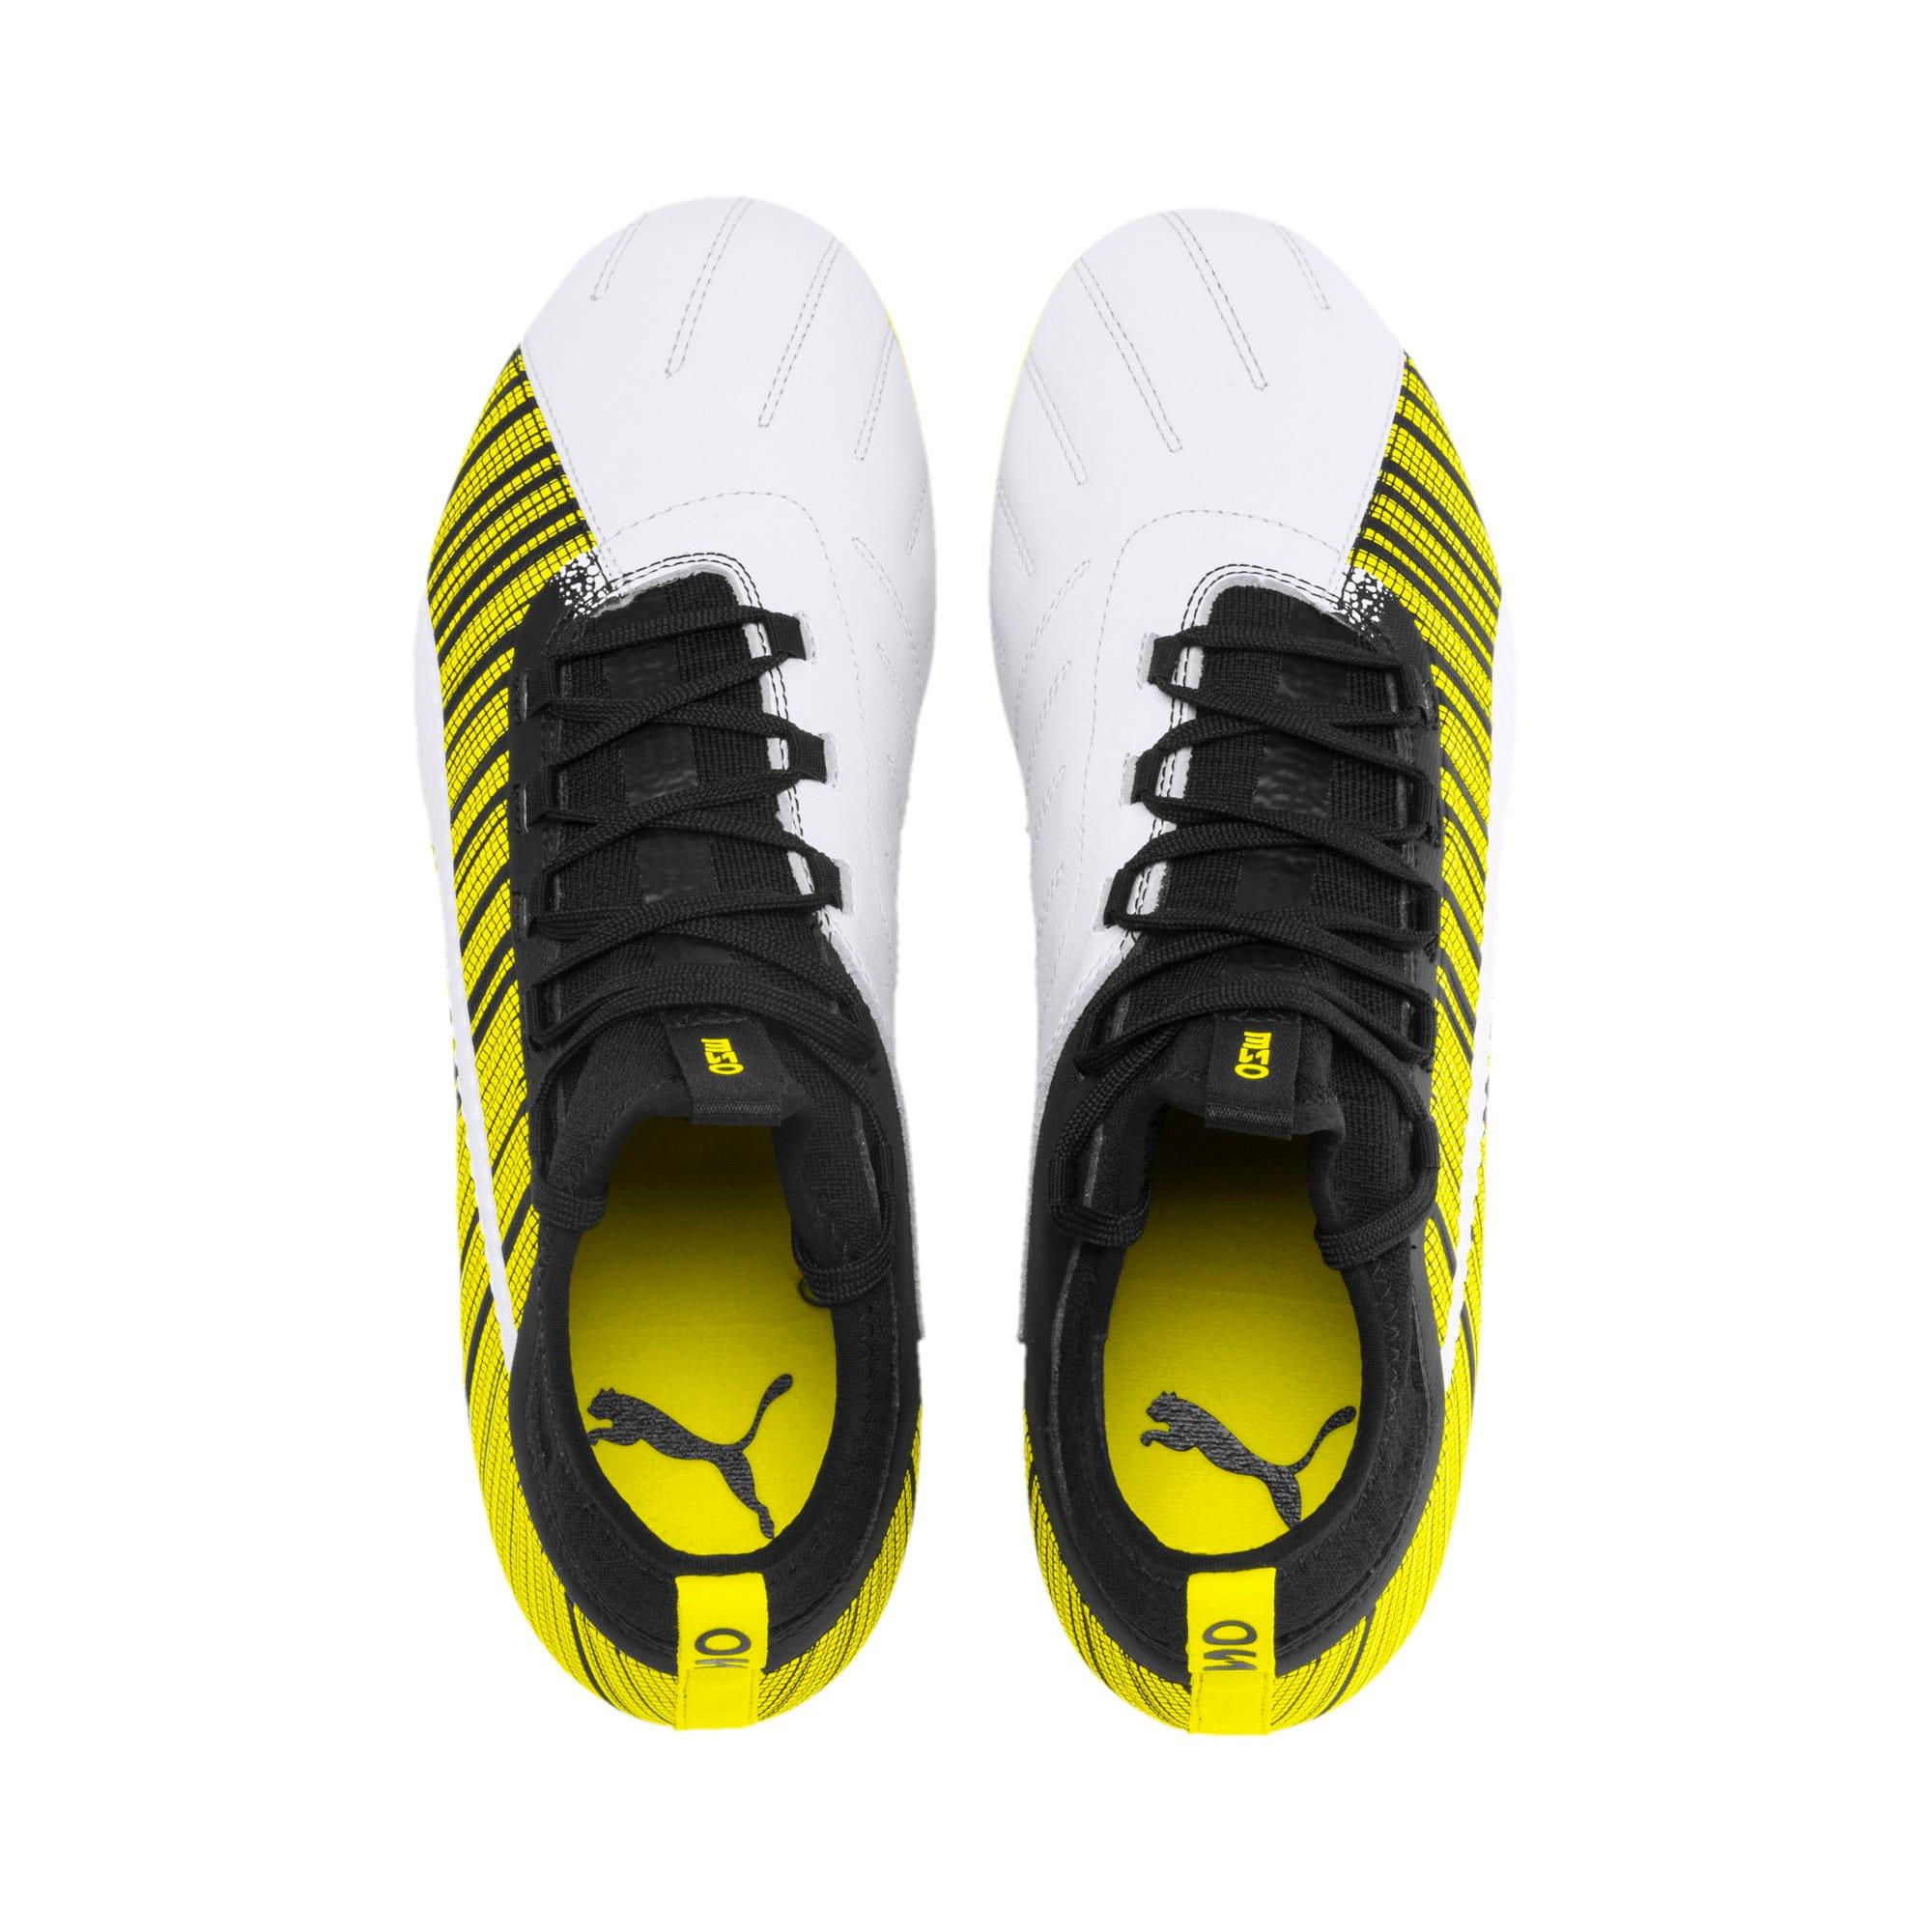 Thumbnail 7 of PUMA ONE 5.3 FG/AG Men's Soccer Cleats, White-Black-Yellow Alert, medium